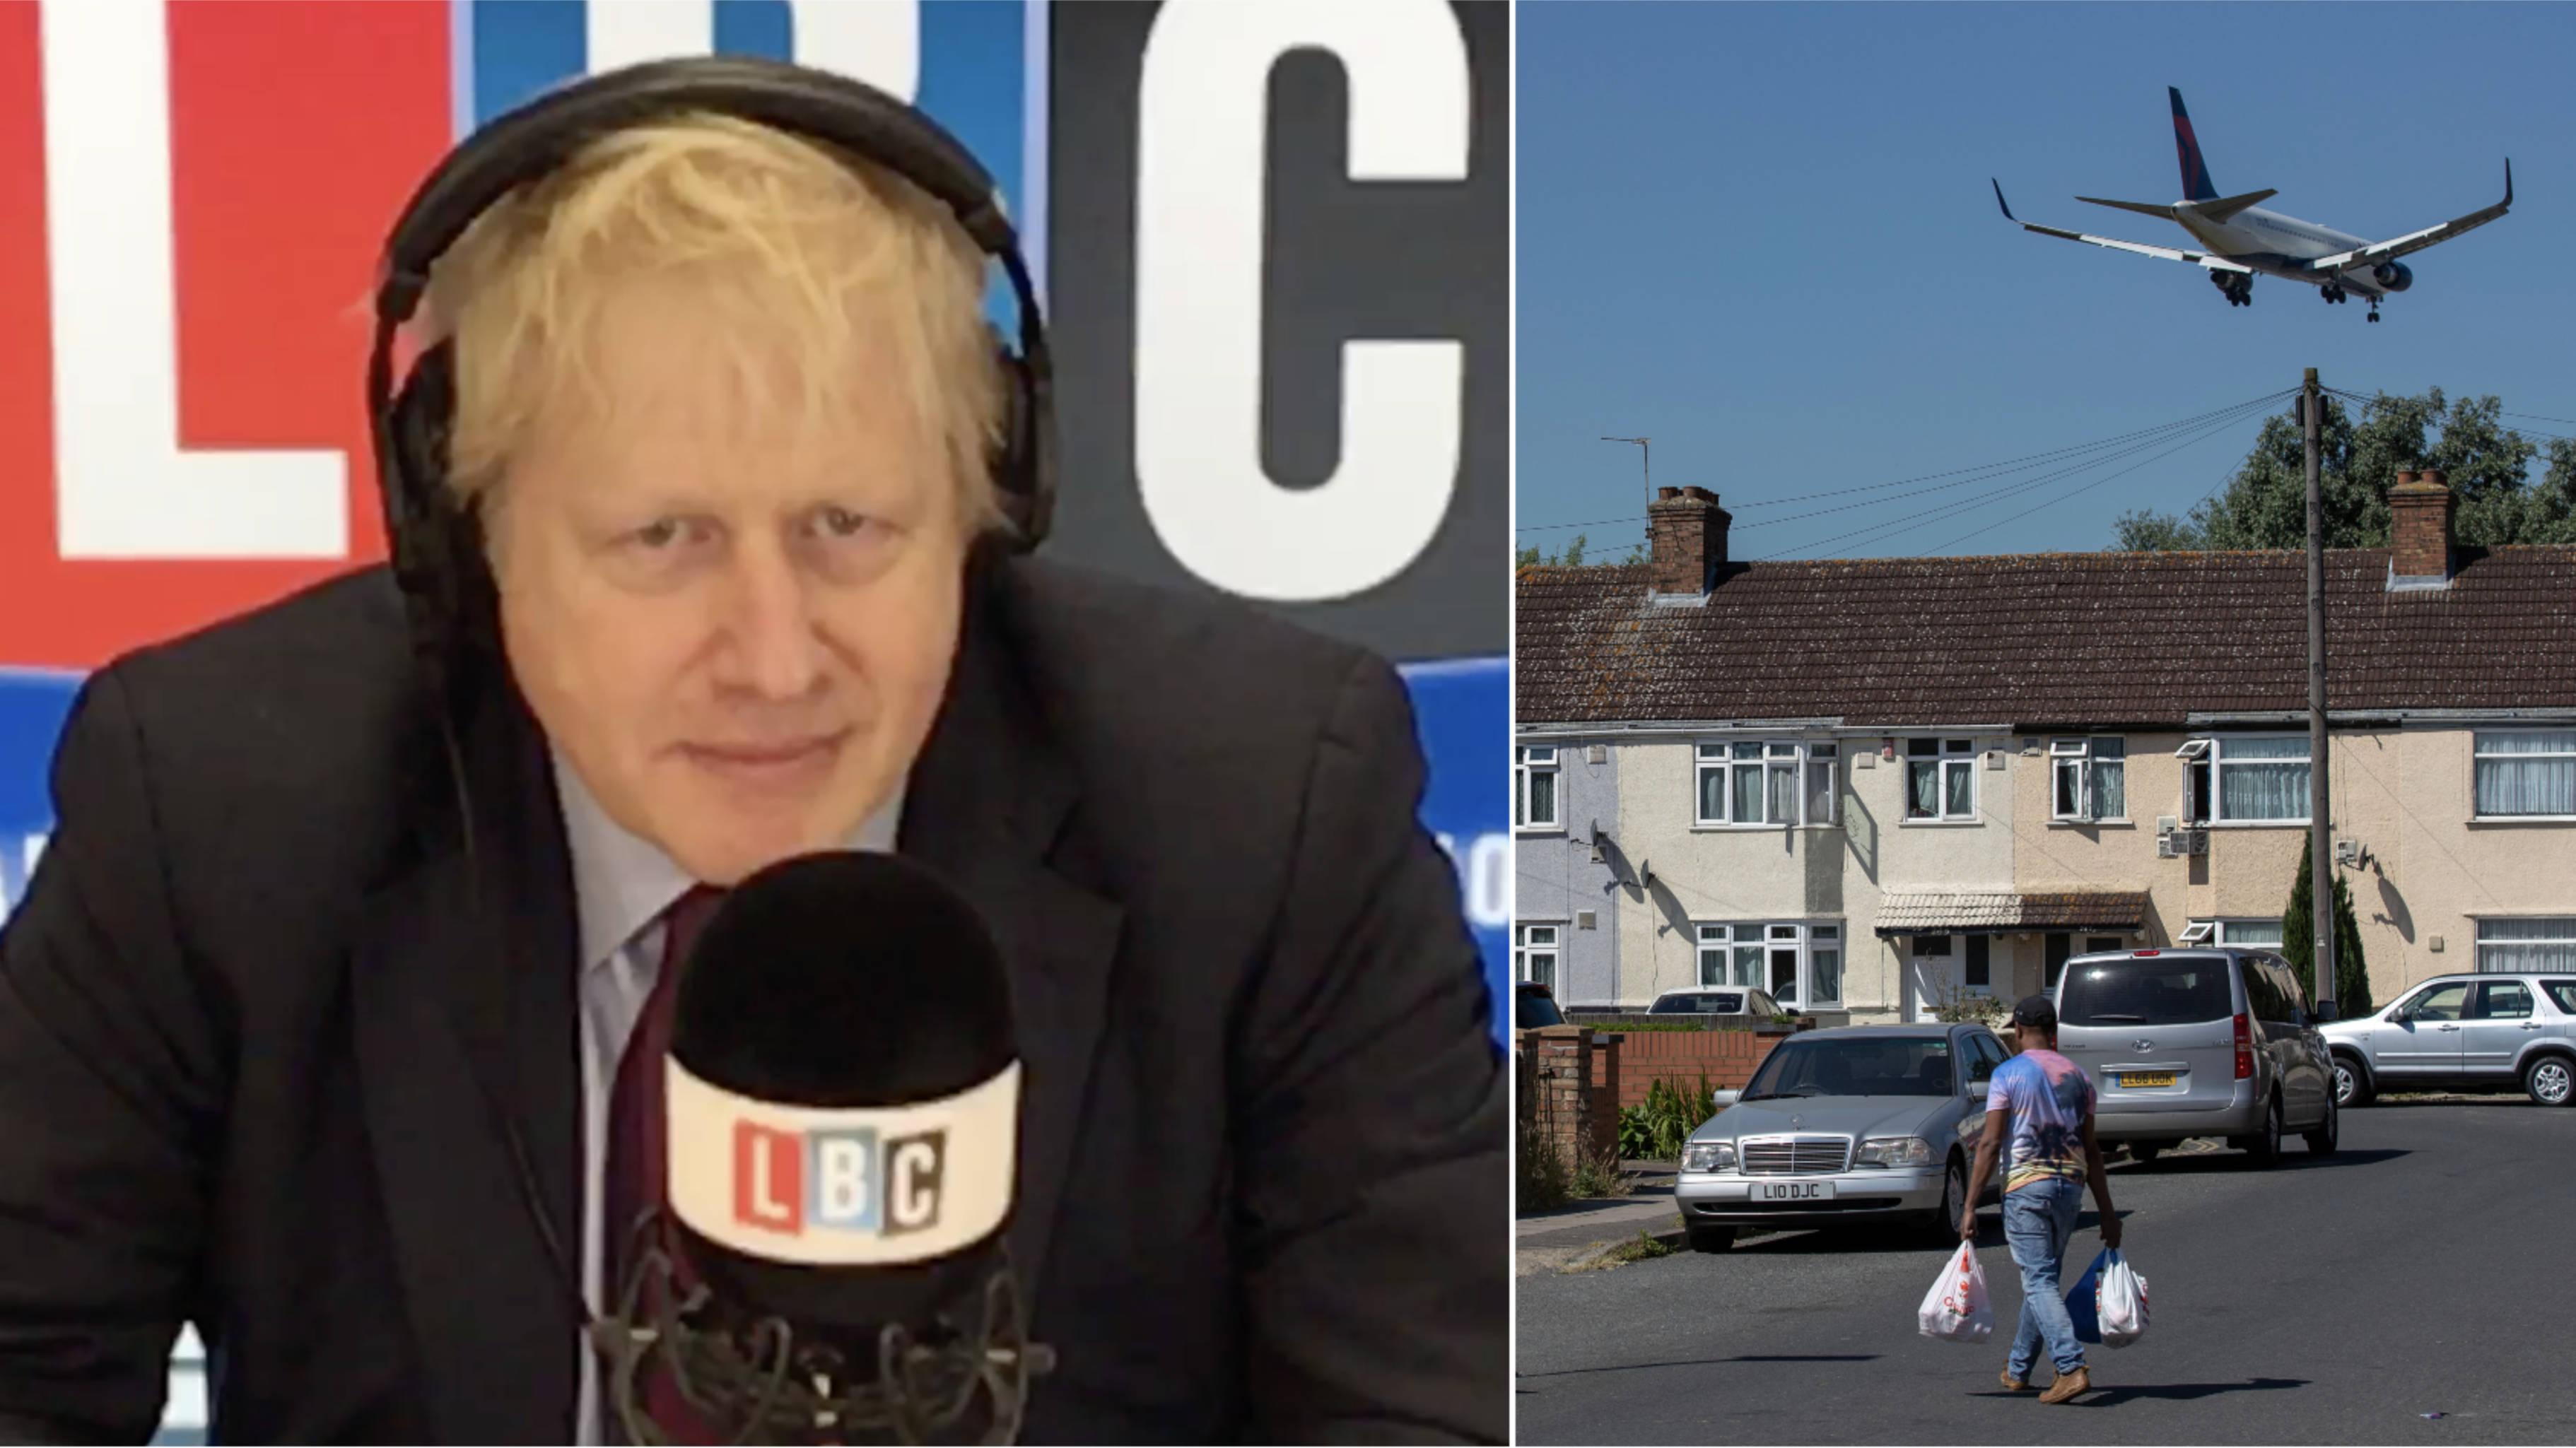 Boris Johnson casts doubt over Heathrow expansion and HS2